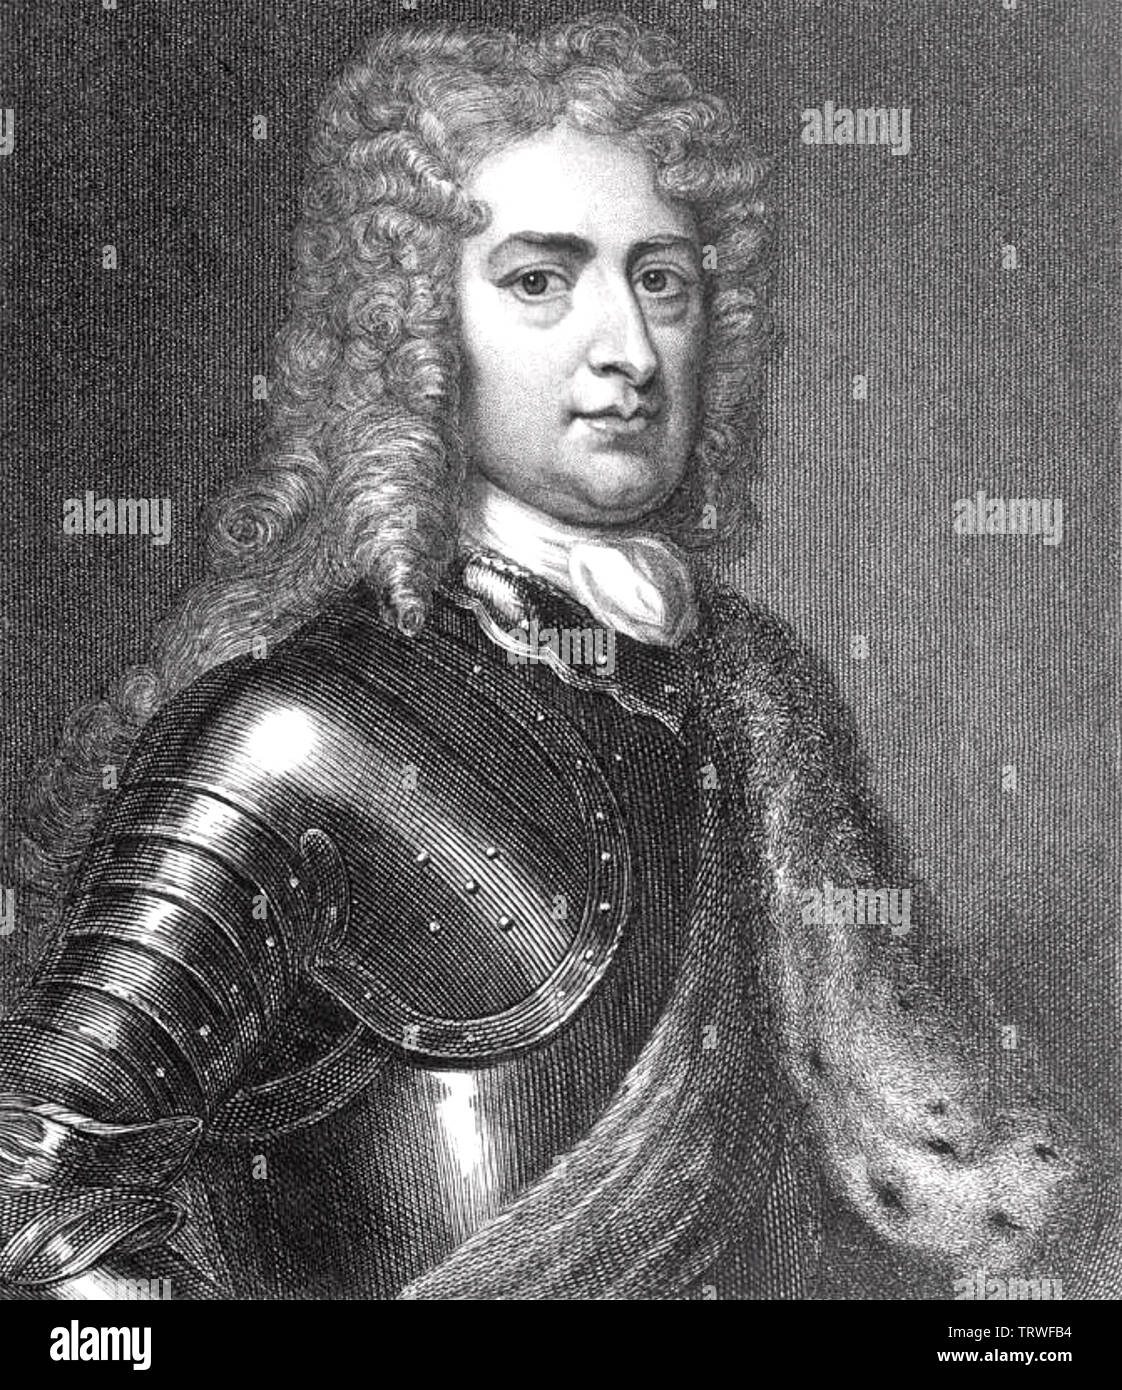 JOHN CHURCHILL, 1st Duke of Marlborough (1650-1722) English soldier and statesman - Stock Image